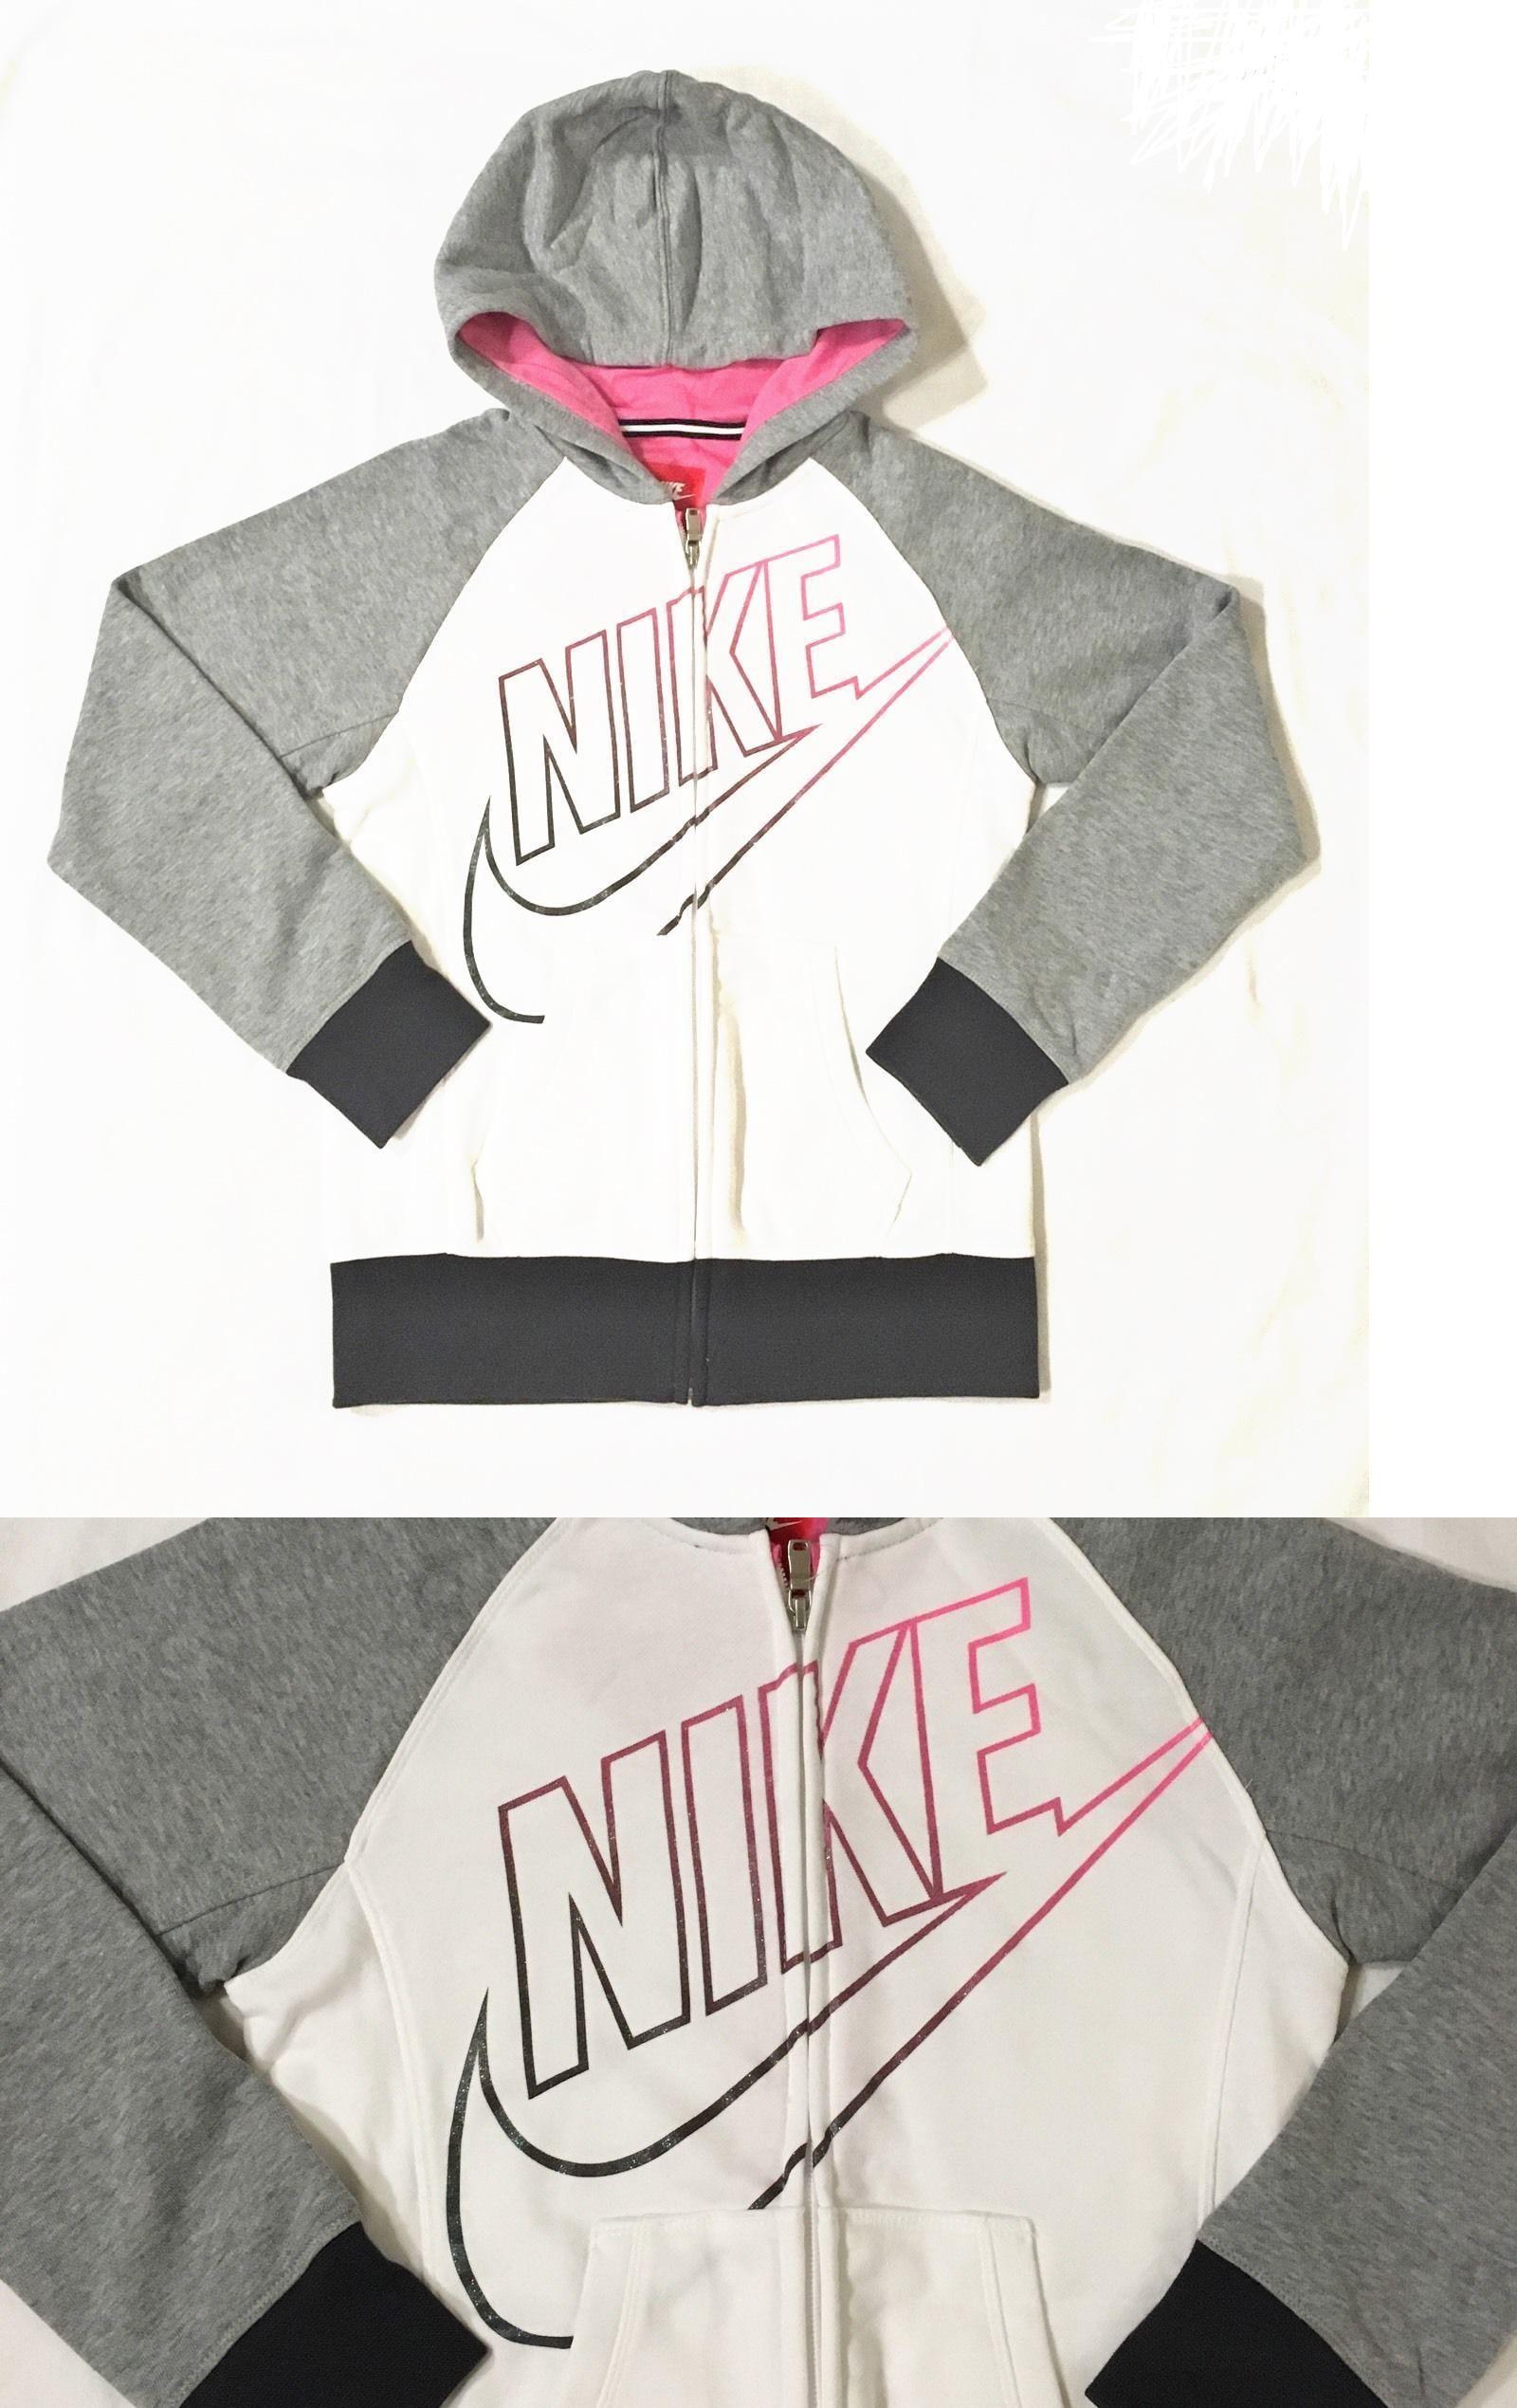 separation shoes 74959 24542 Nike Sweatshirts Ebay | RLDM